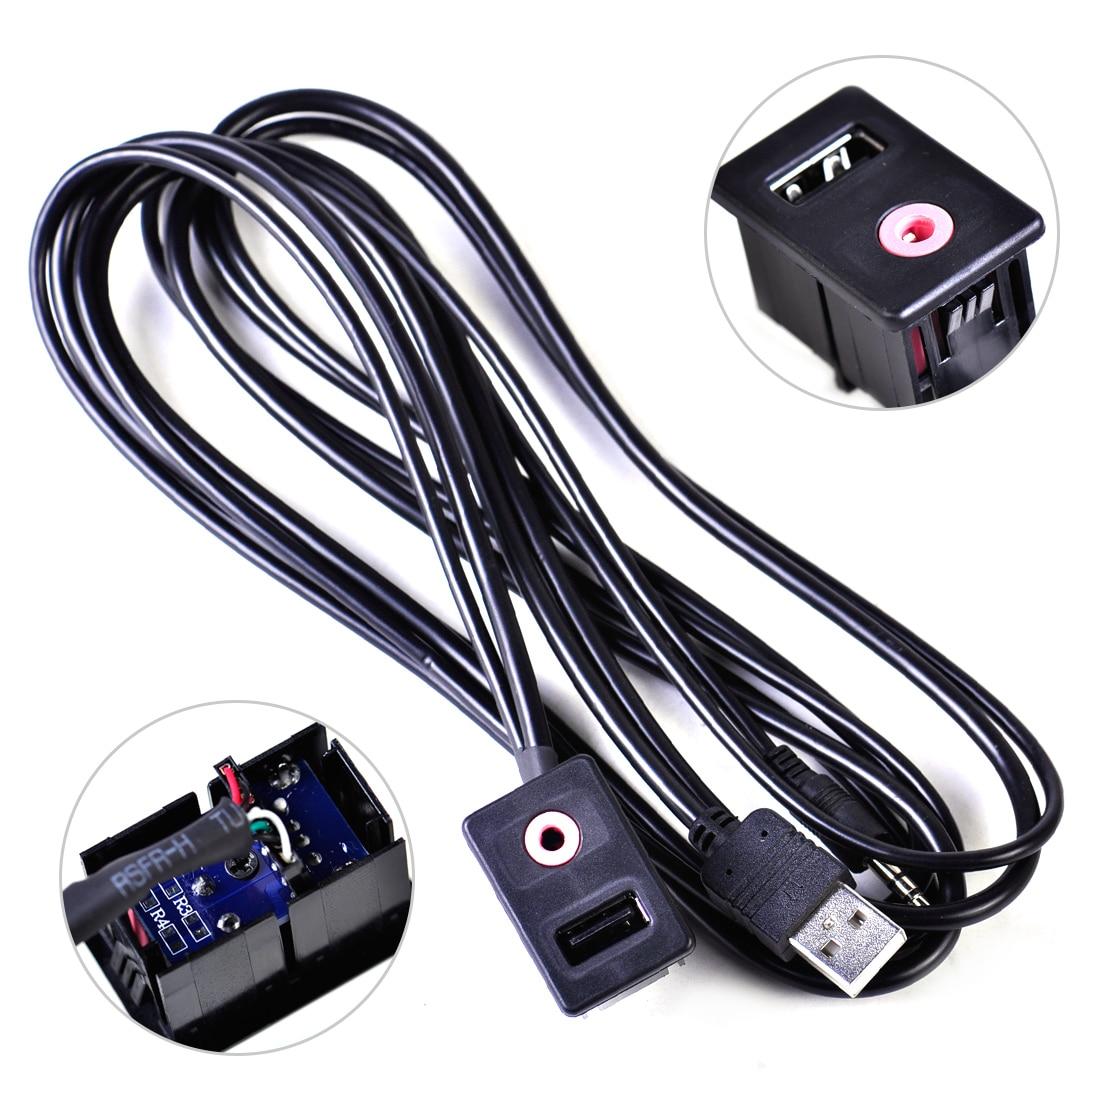 DWCX New 6 Feet USB 3 5mm to USB 3 5mm AUX Dashboard Flush Mount Dash